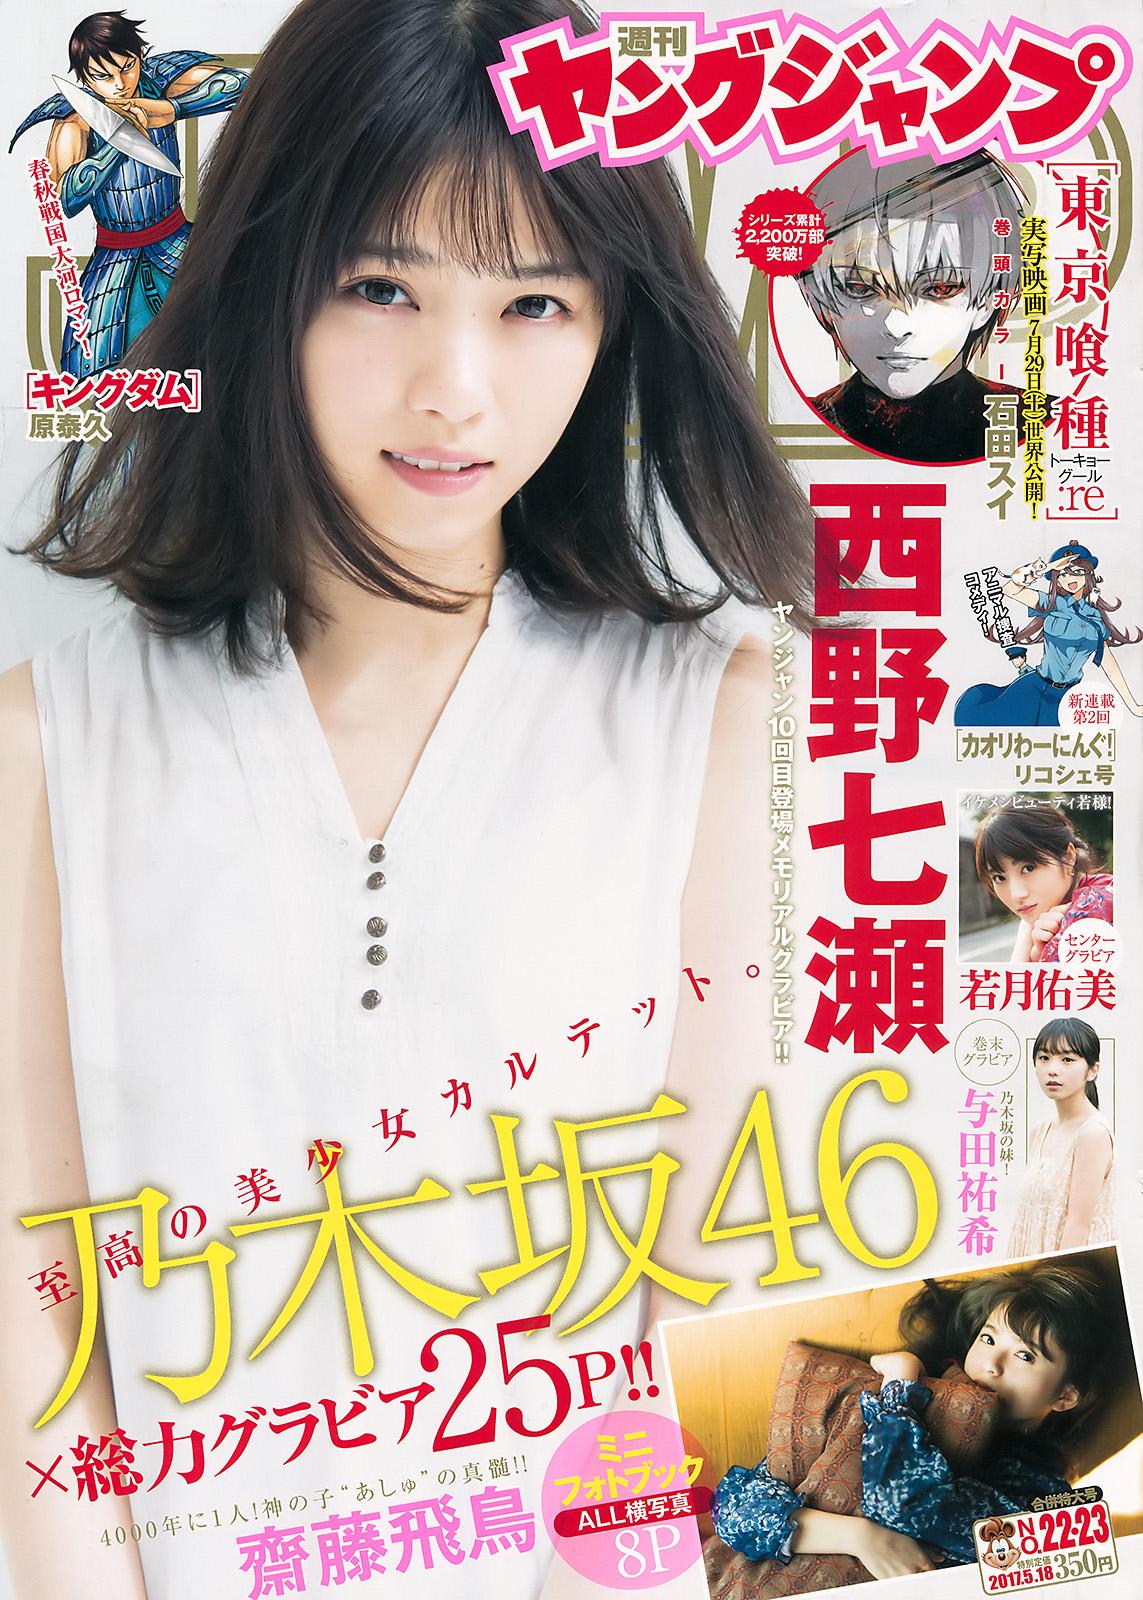 Nishino Nanase 西野七瀬 Nogizaka46, Young Jump 2017.05.18 No.22 (週刊ヤングジャンプ 2017年22号)